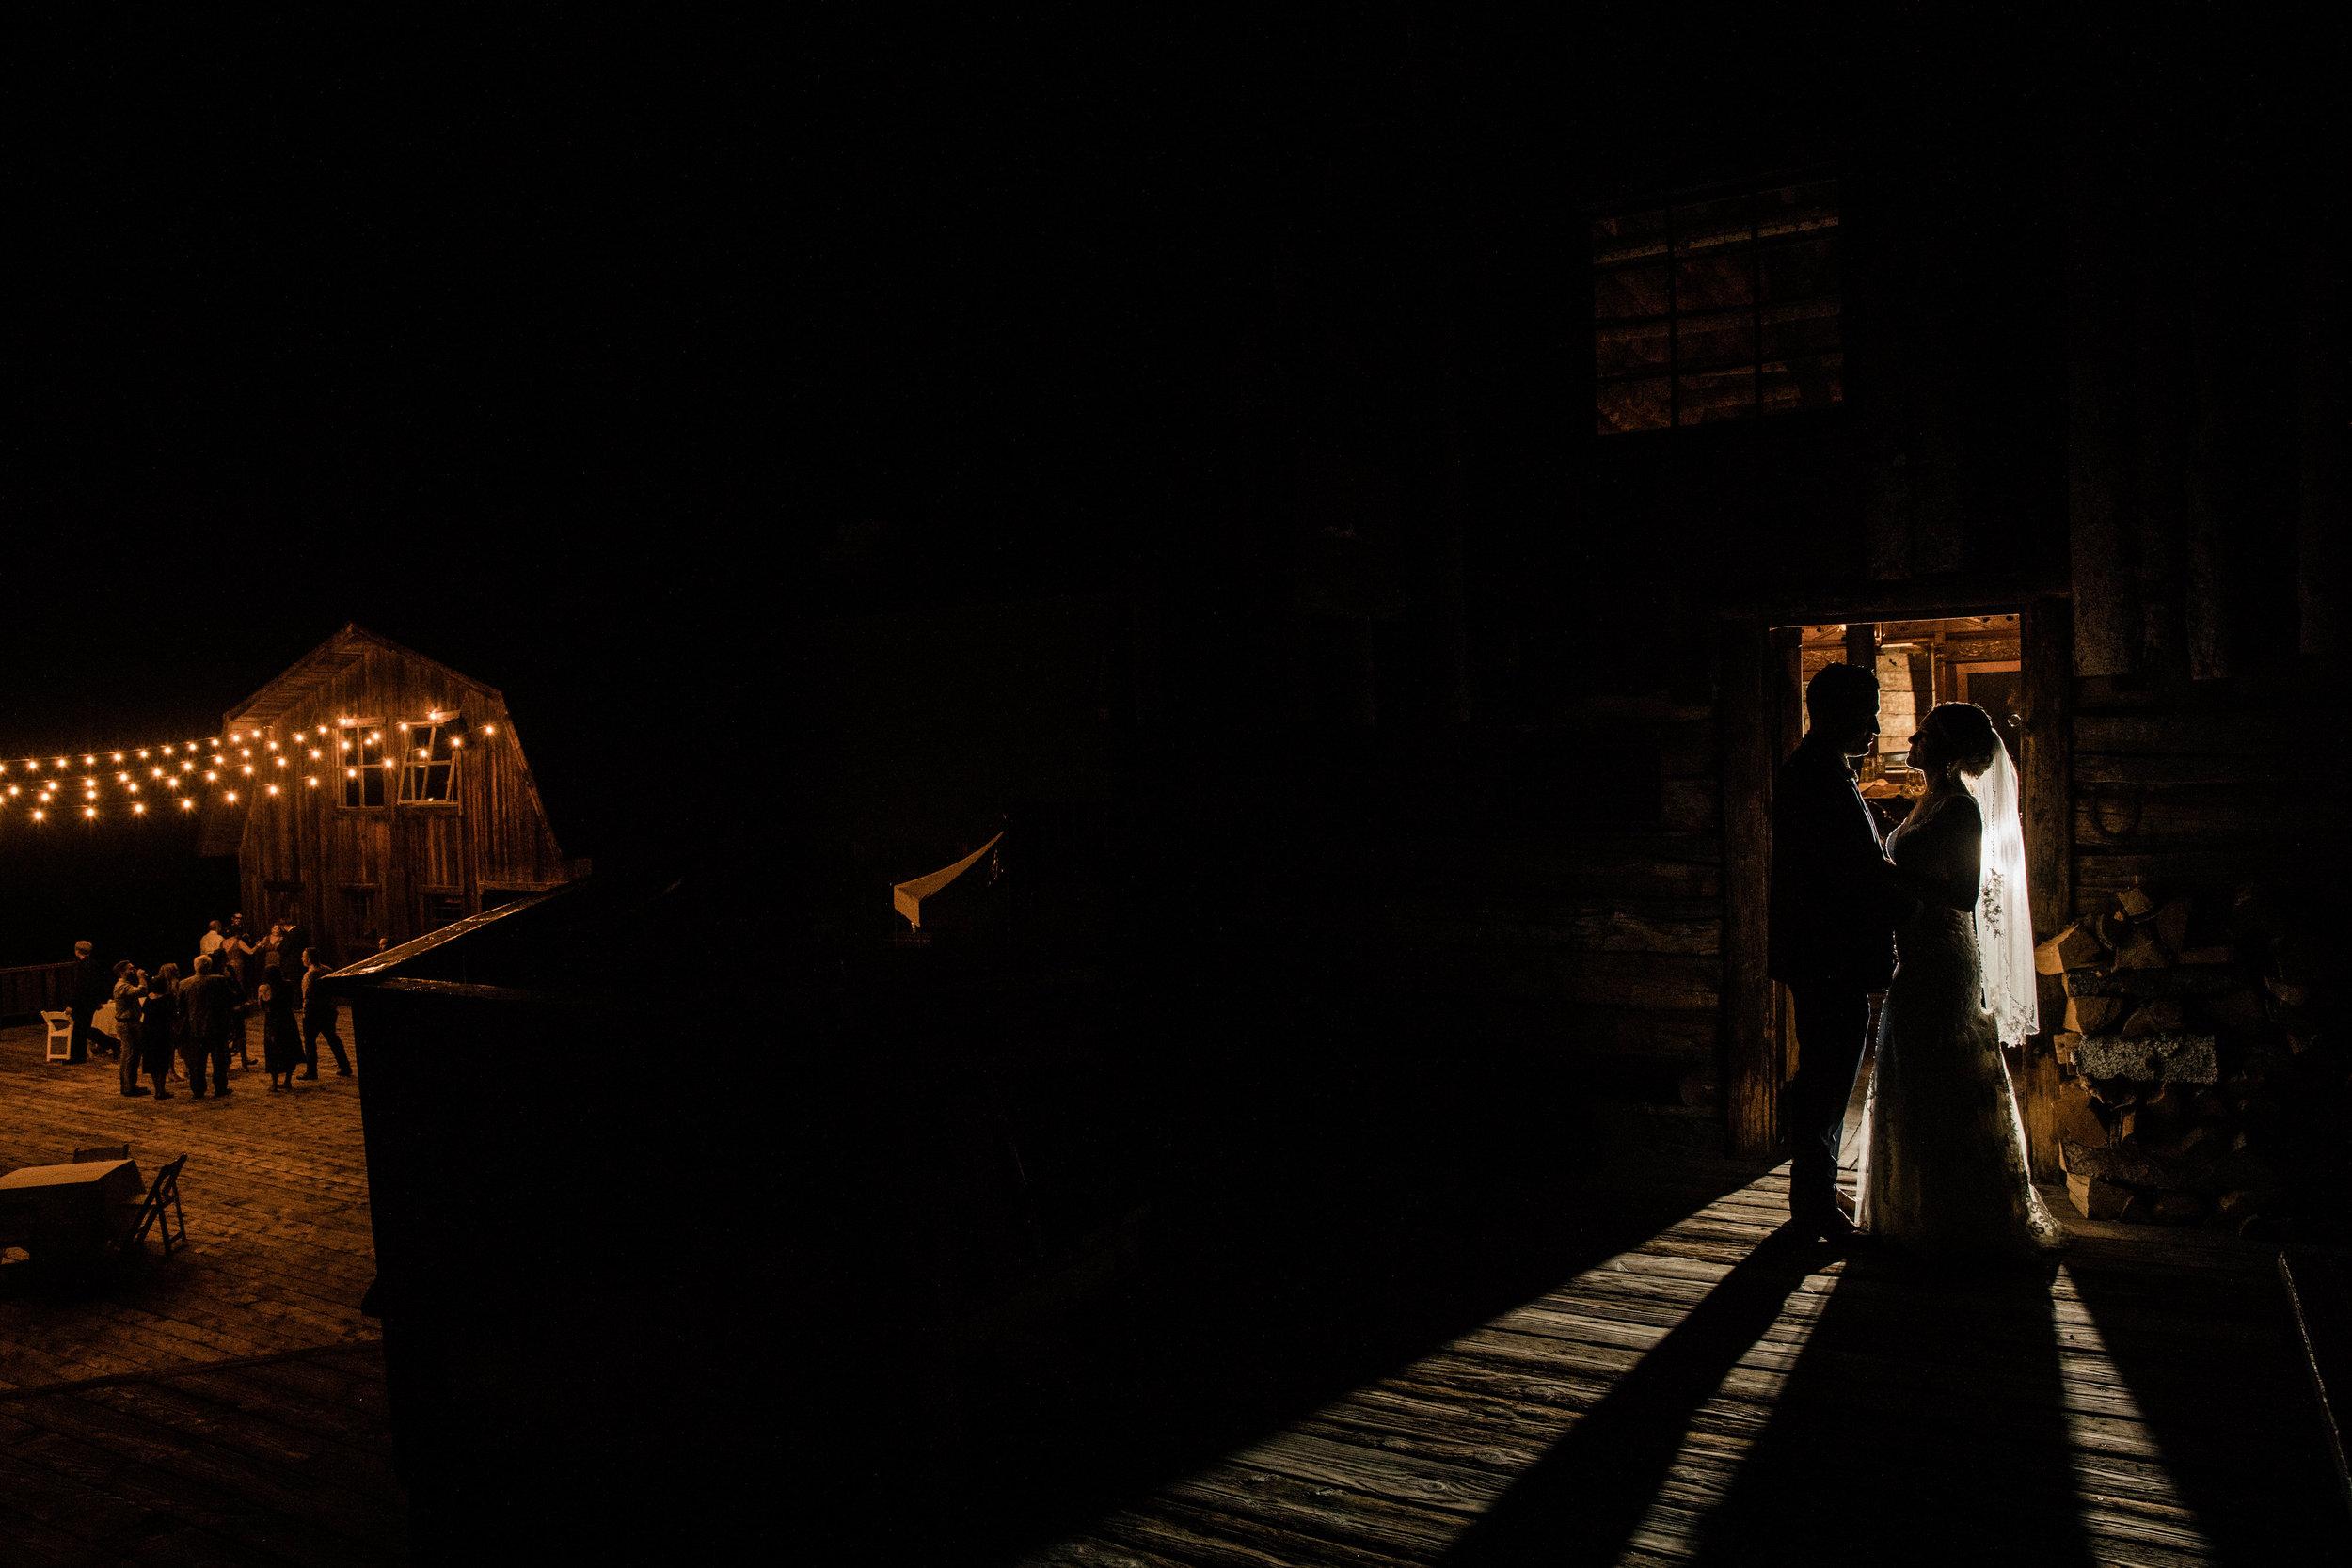 leahandashton-telluride-wedding-photography-0095.jpg